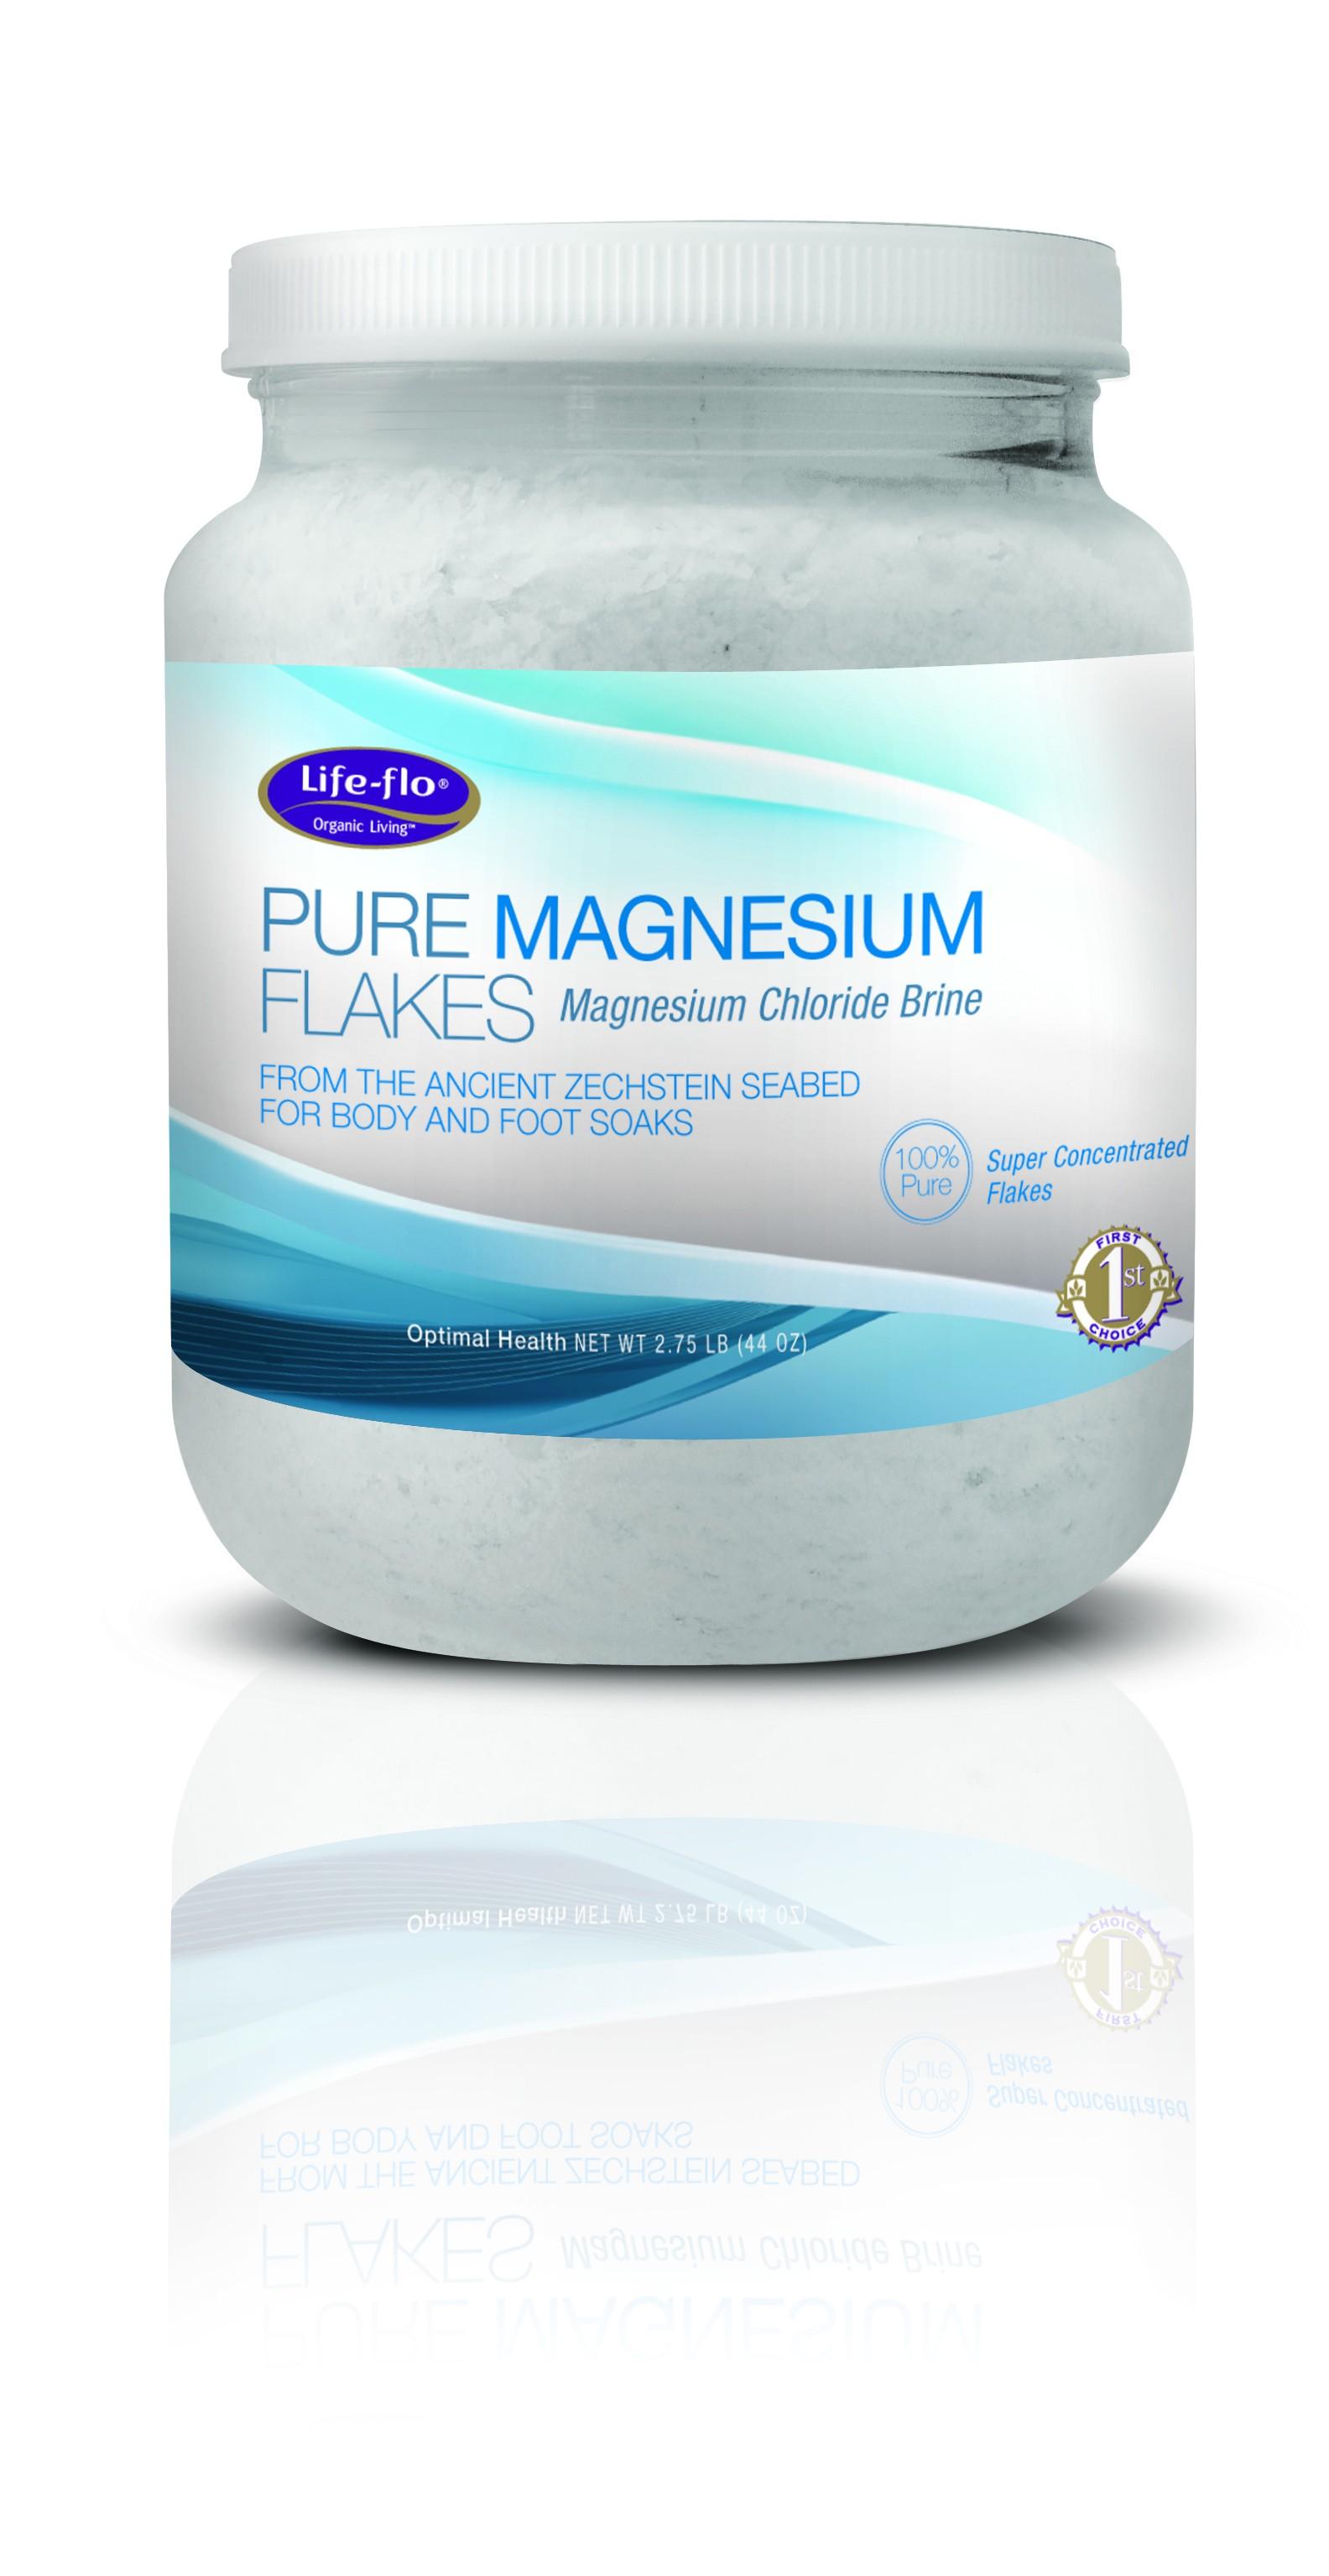 Magnesium Flakes 2 75 lb 1320ml Life-Flo